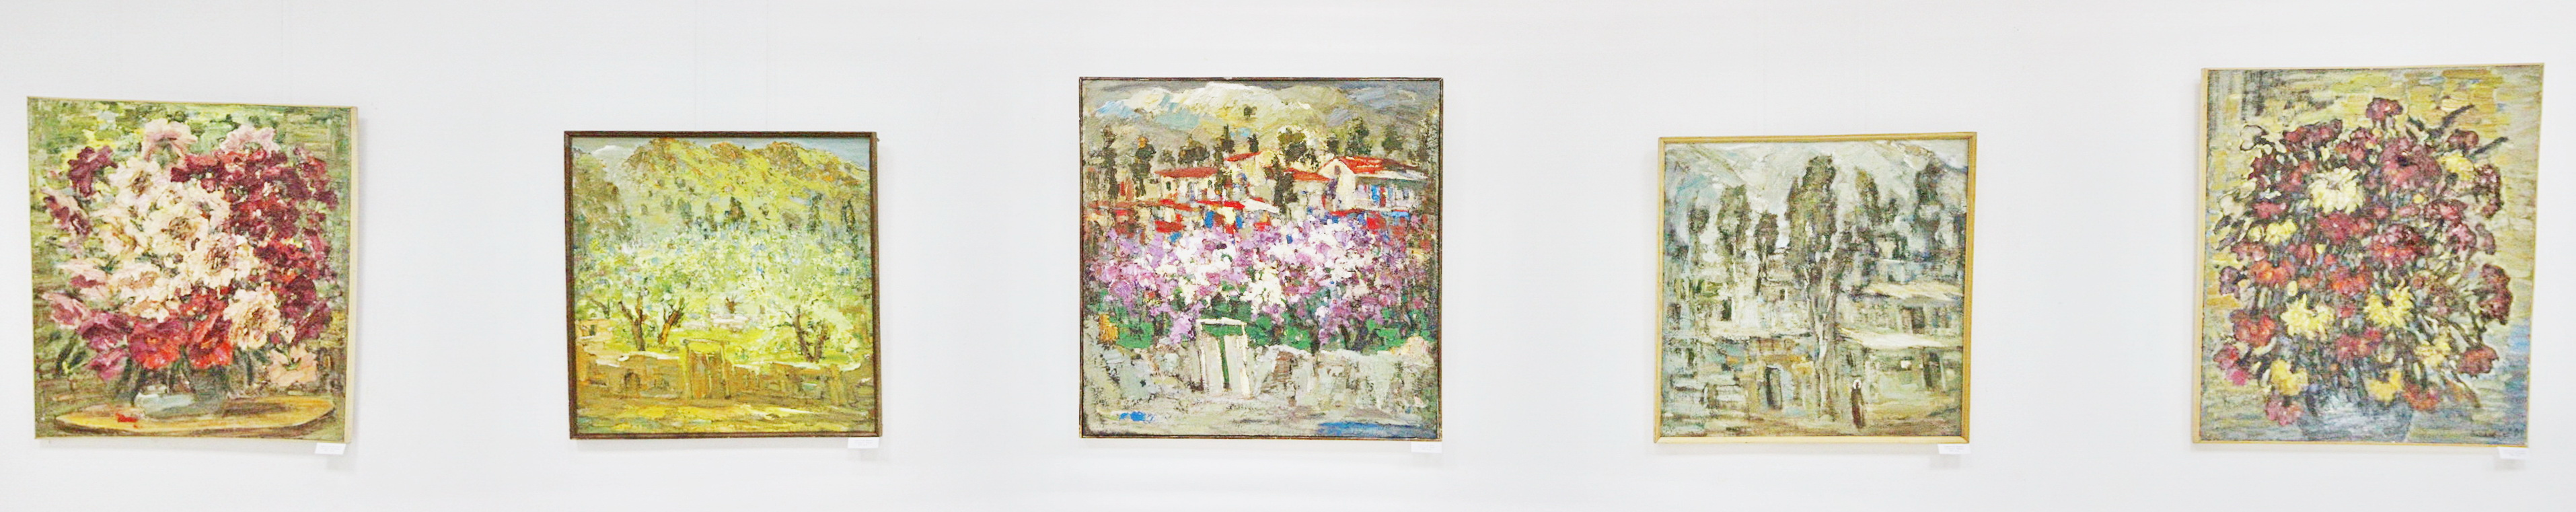 Гаглоева Римма. Экспозиция картин. 2020